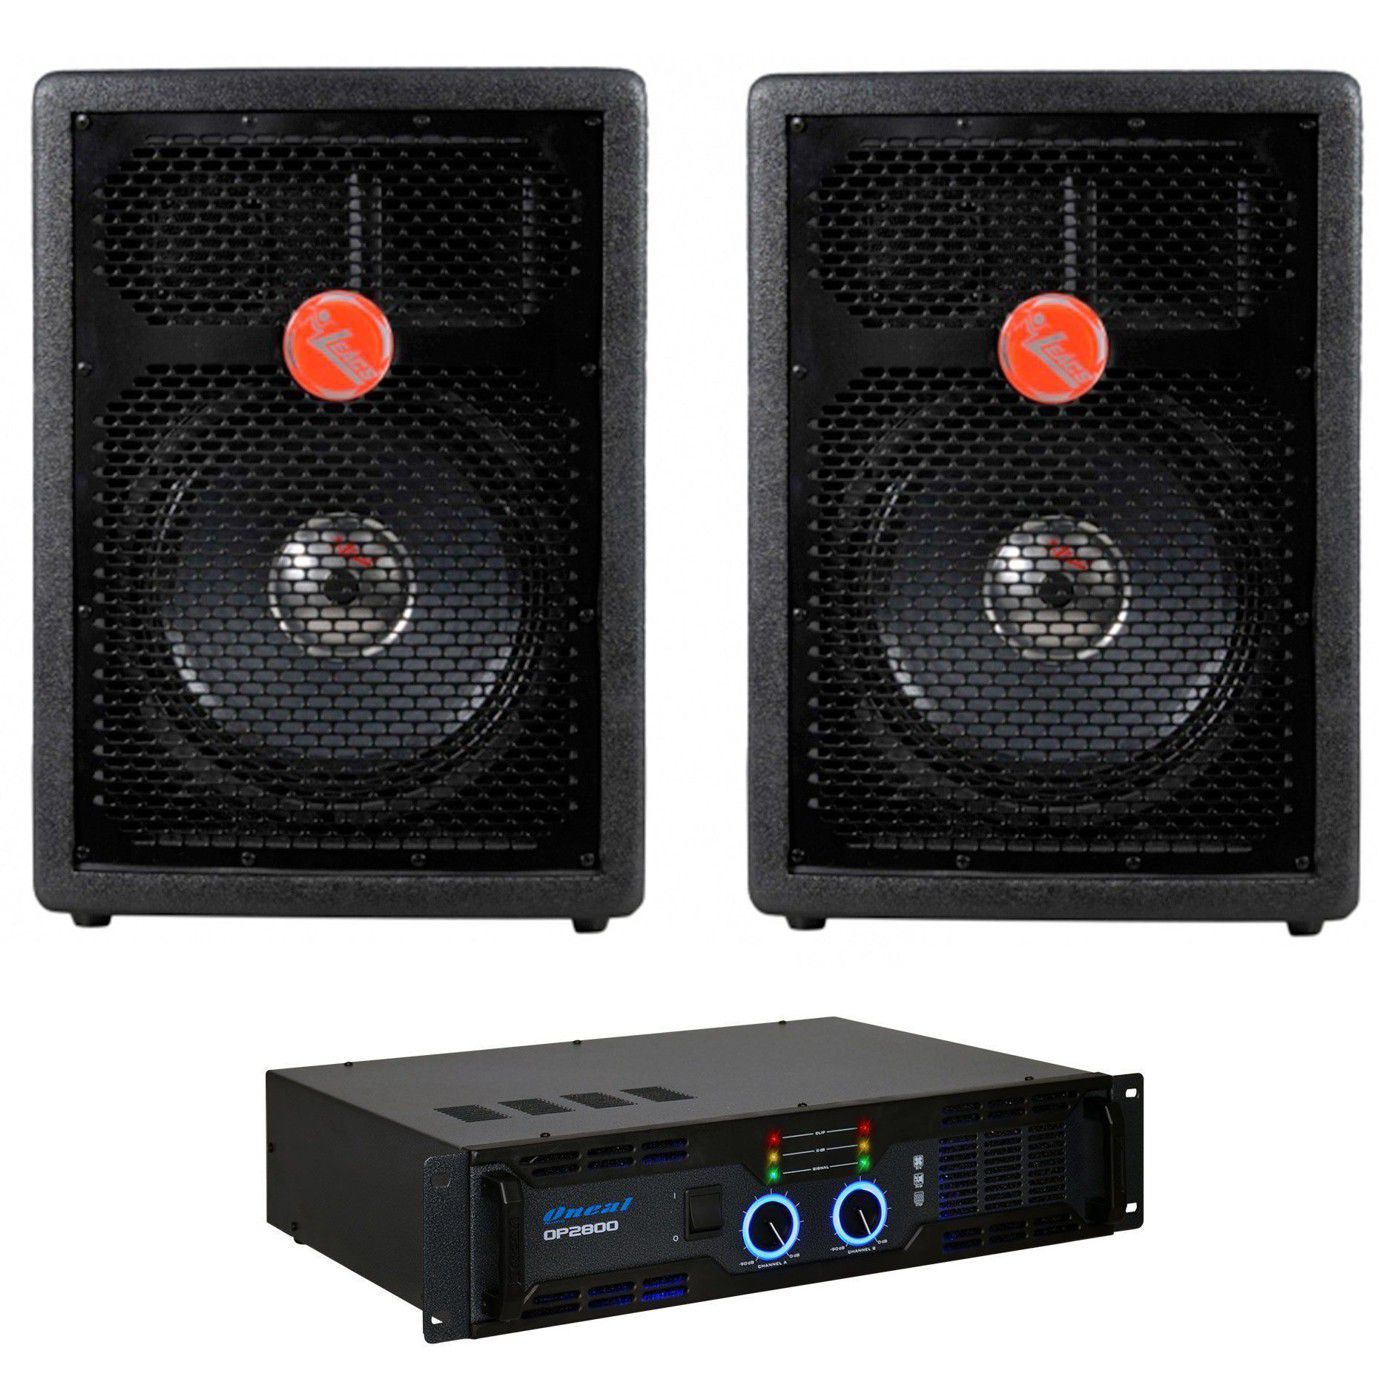 Kit 2 Caixa Acústica Leacs Fit550 + Amplificador Oneal Op2800